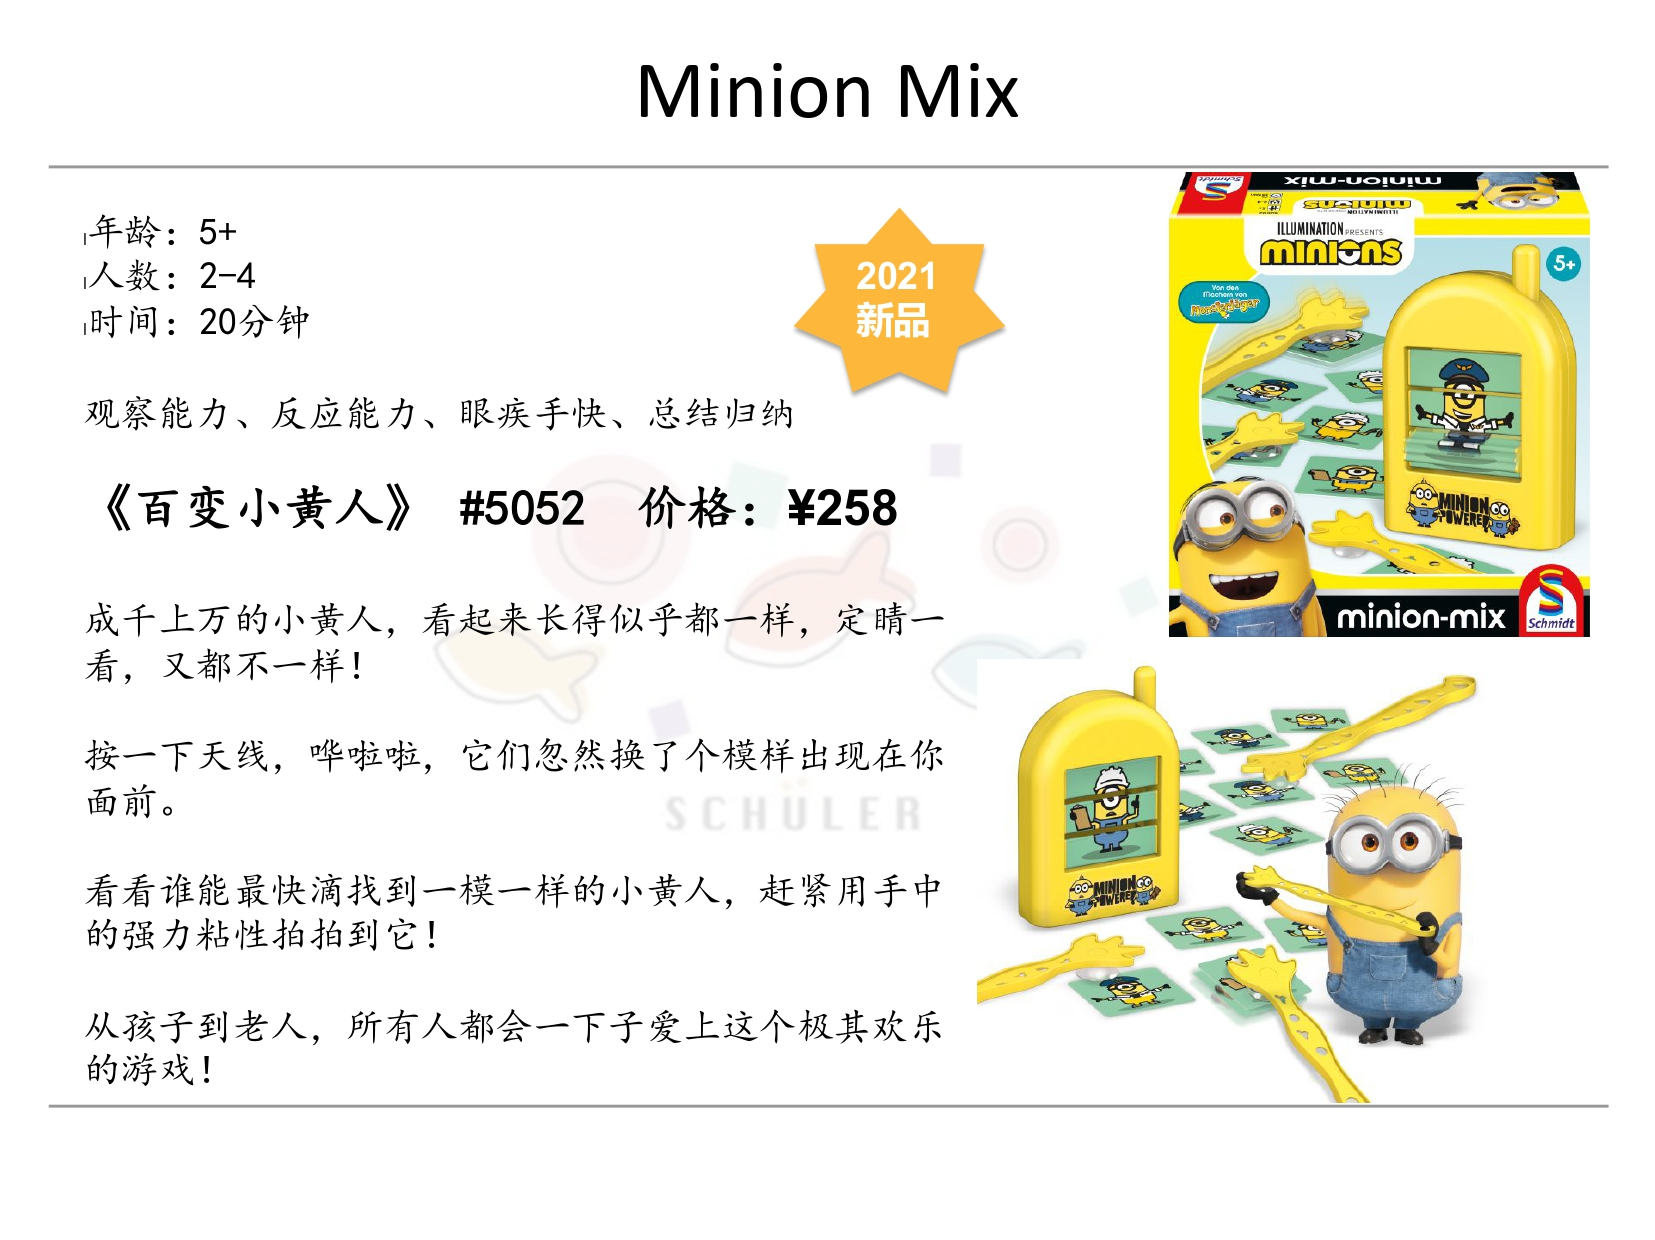 Minion Mix 百变小黄人